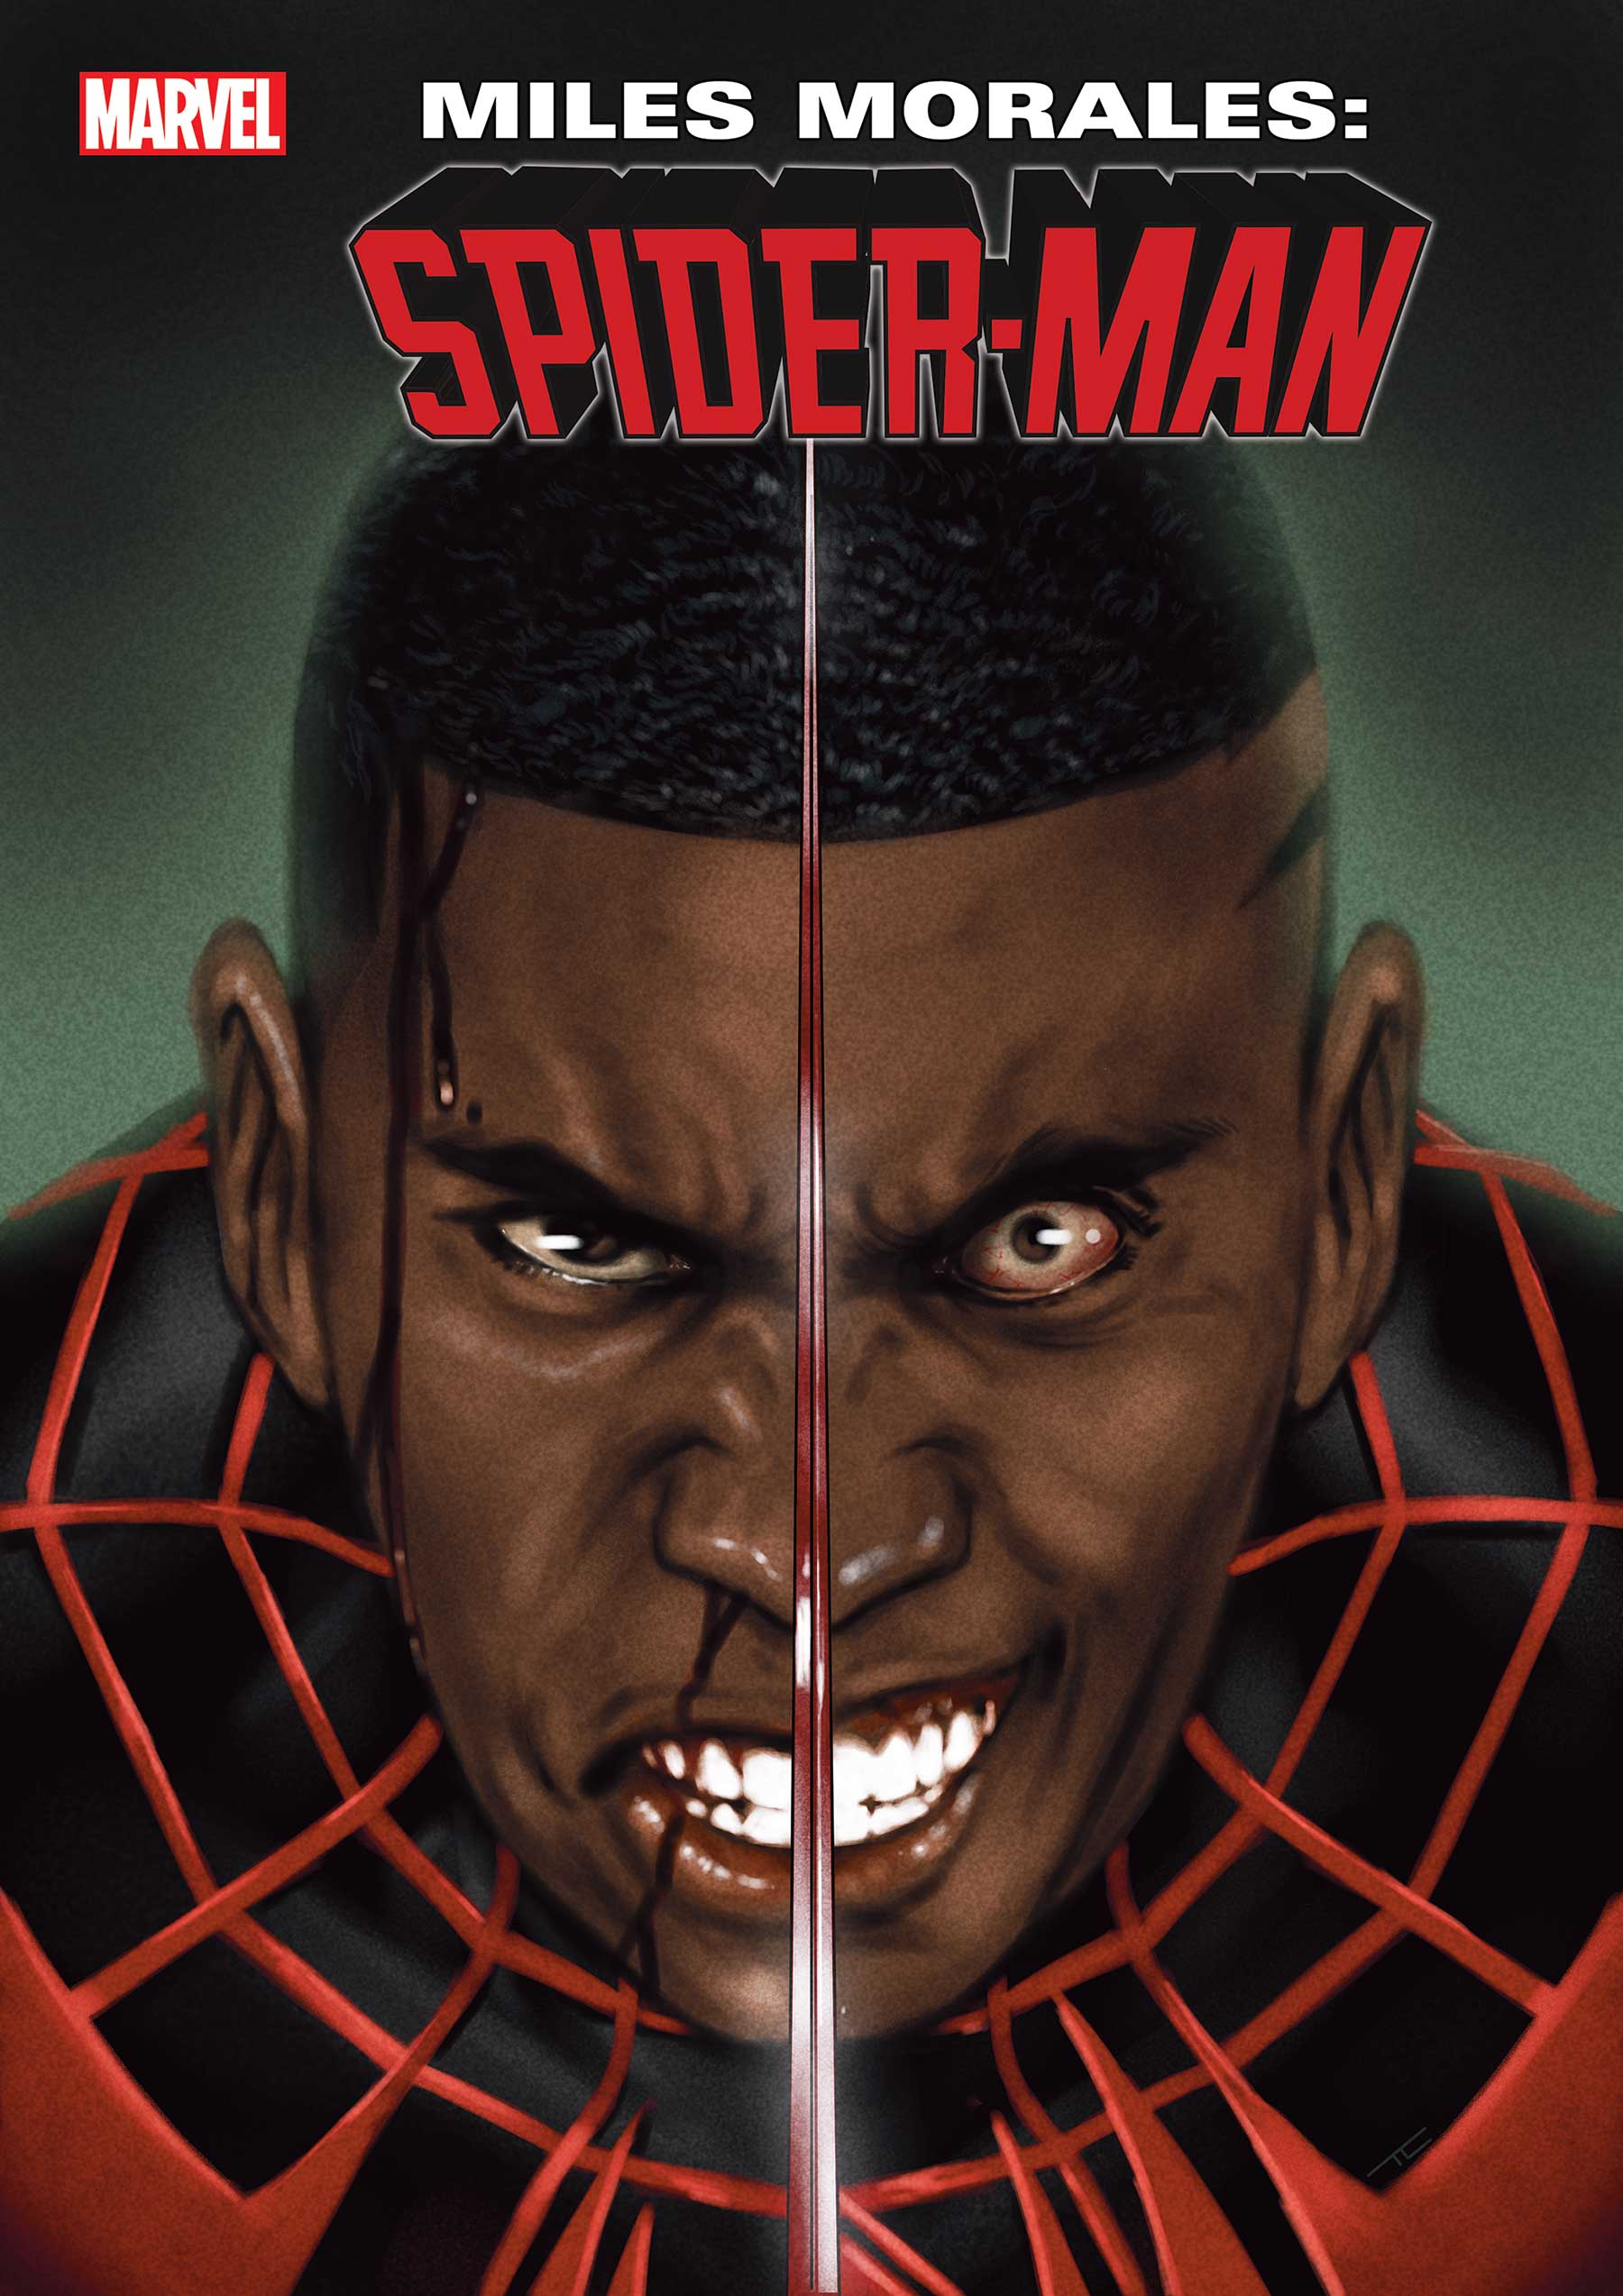 Miles Morales: Spider-Man (2018) #27